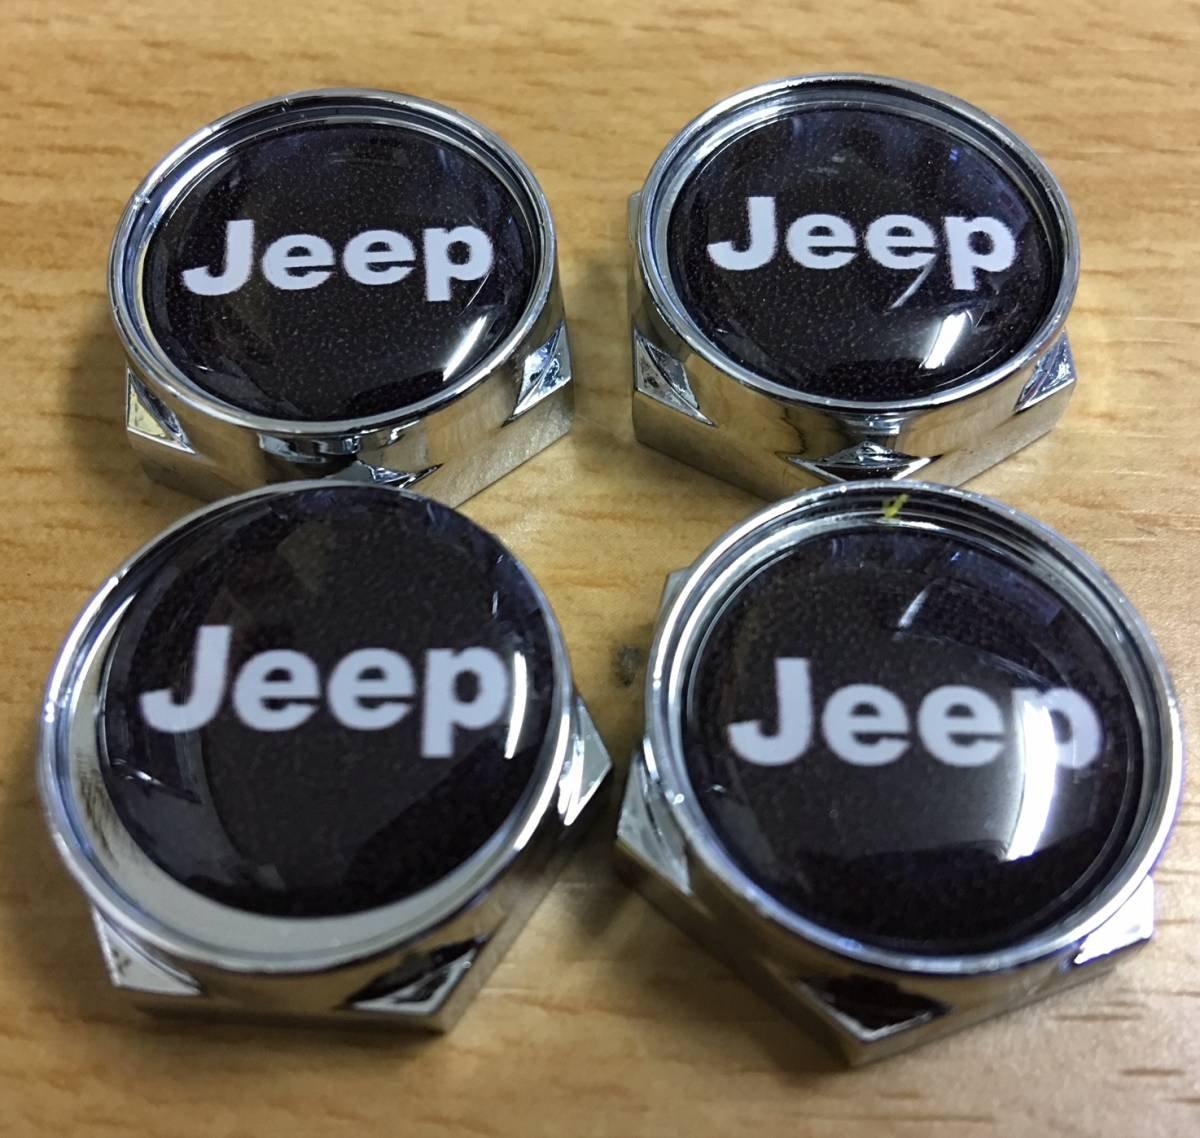 bleqi Chrome Metal Sports Style Car License Plate Frame Universal Bolt Screws For JEEP bleqi.co.ltd